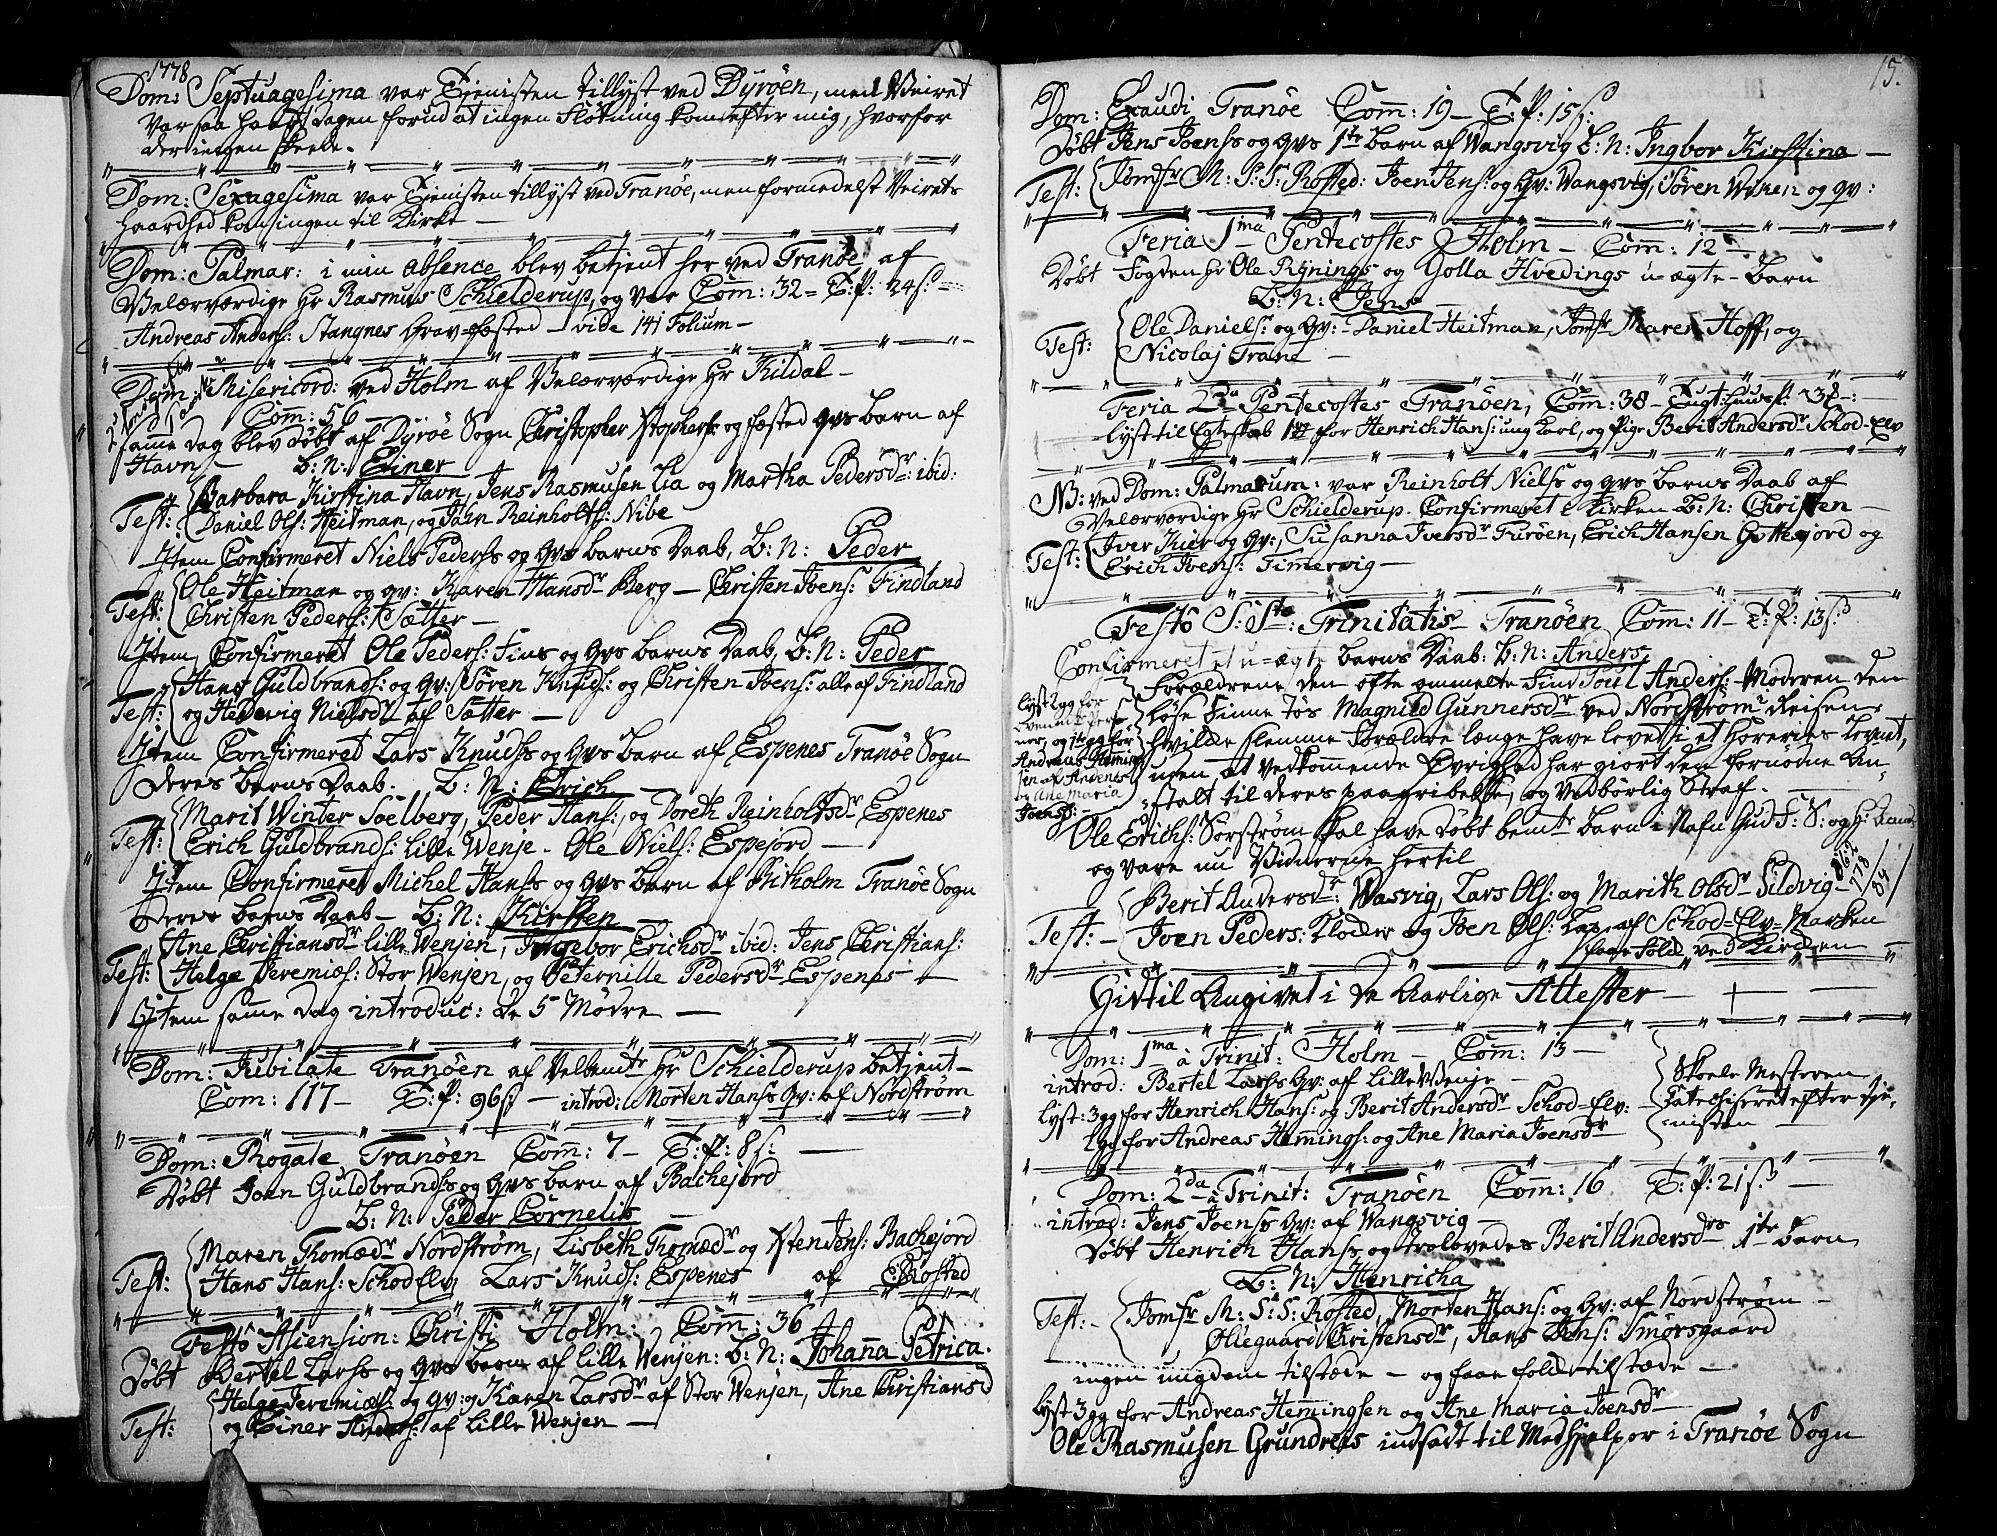 SATØ, Tranøy sokneprestkontor, I/Ia/Iaa/L0002kirke: Ministerialbok nr. 2, 1773-1806, s. 15